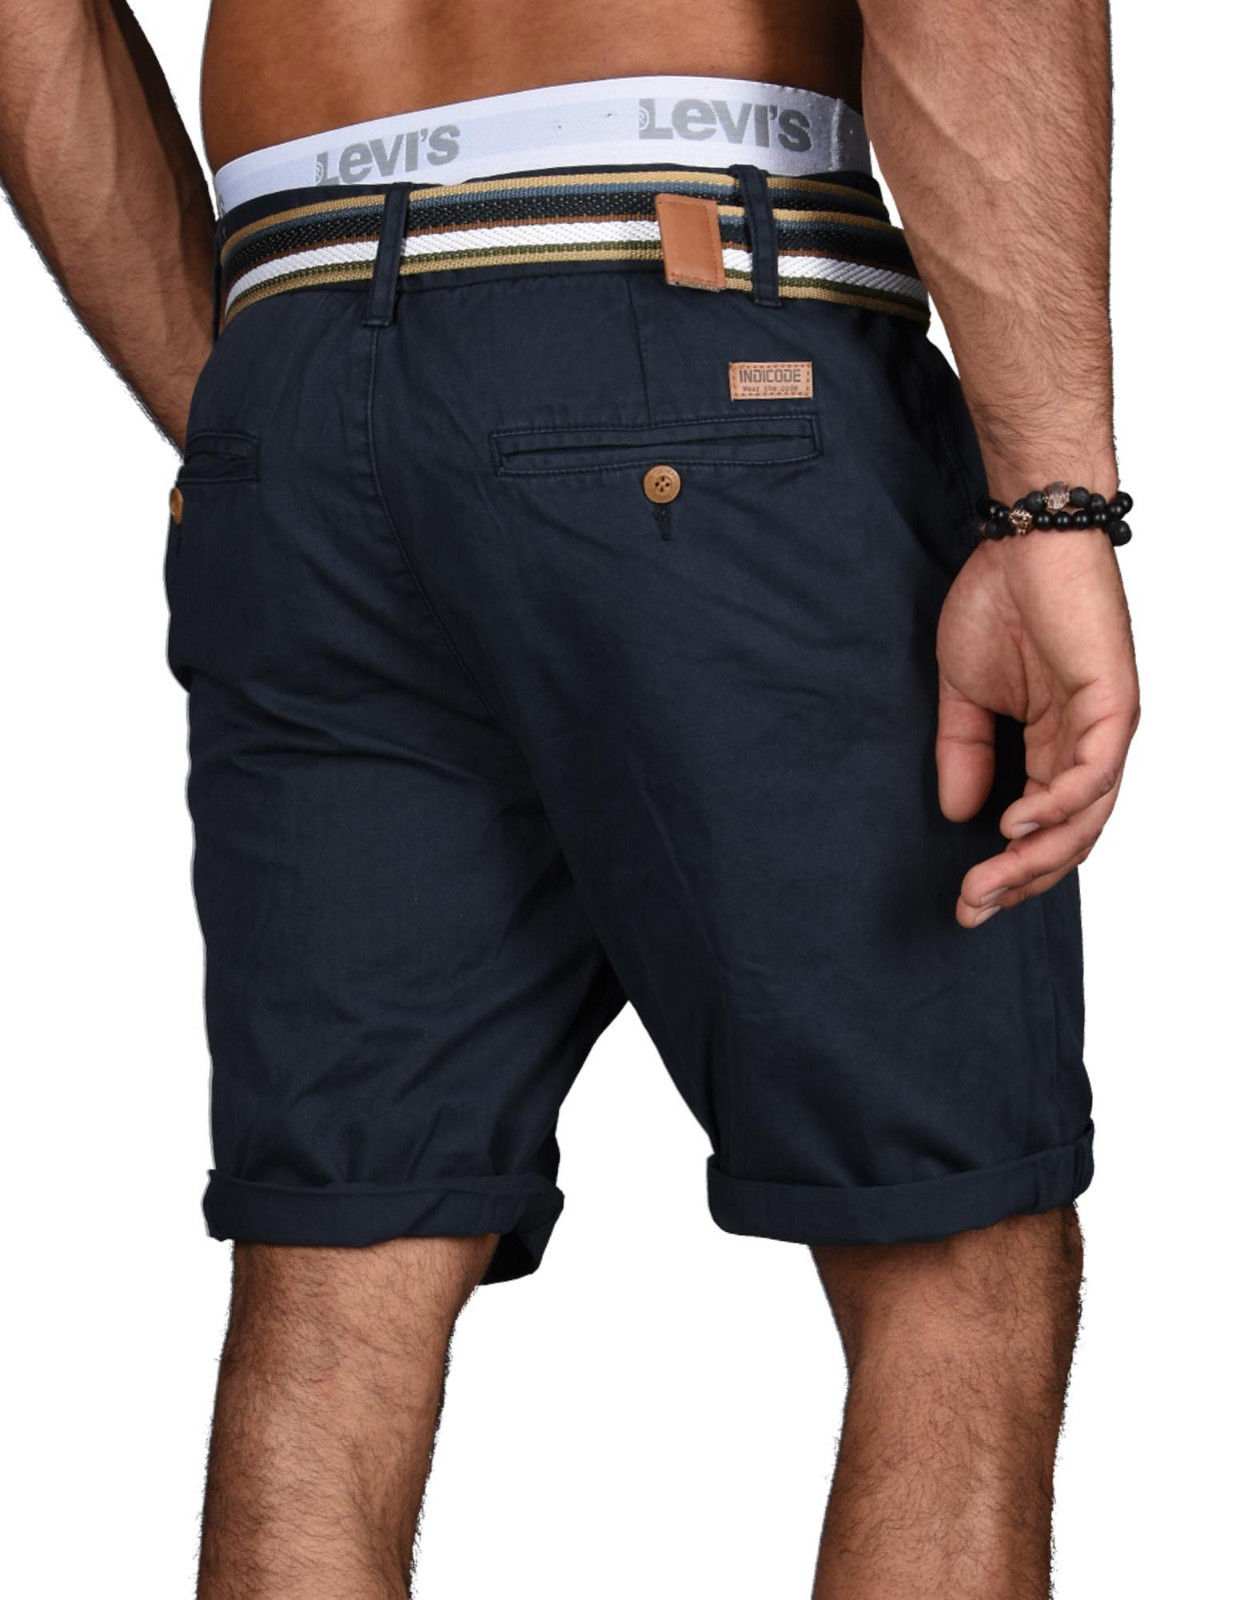 Indicode-Herren-Sommer-Bermuda-Chino-Shorts-kurze-Hose-Sommerhose-Short-NEU-B499 Indexbild 16